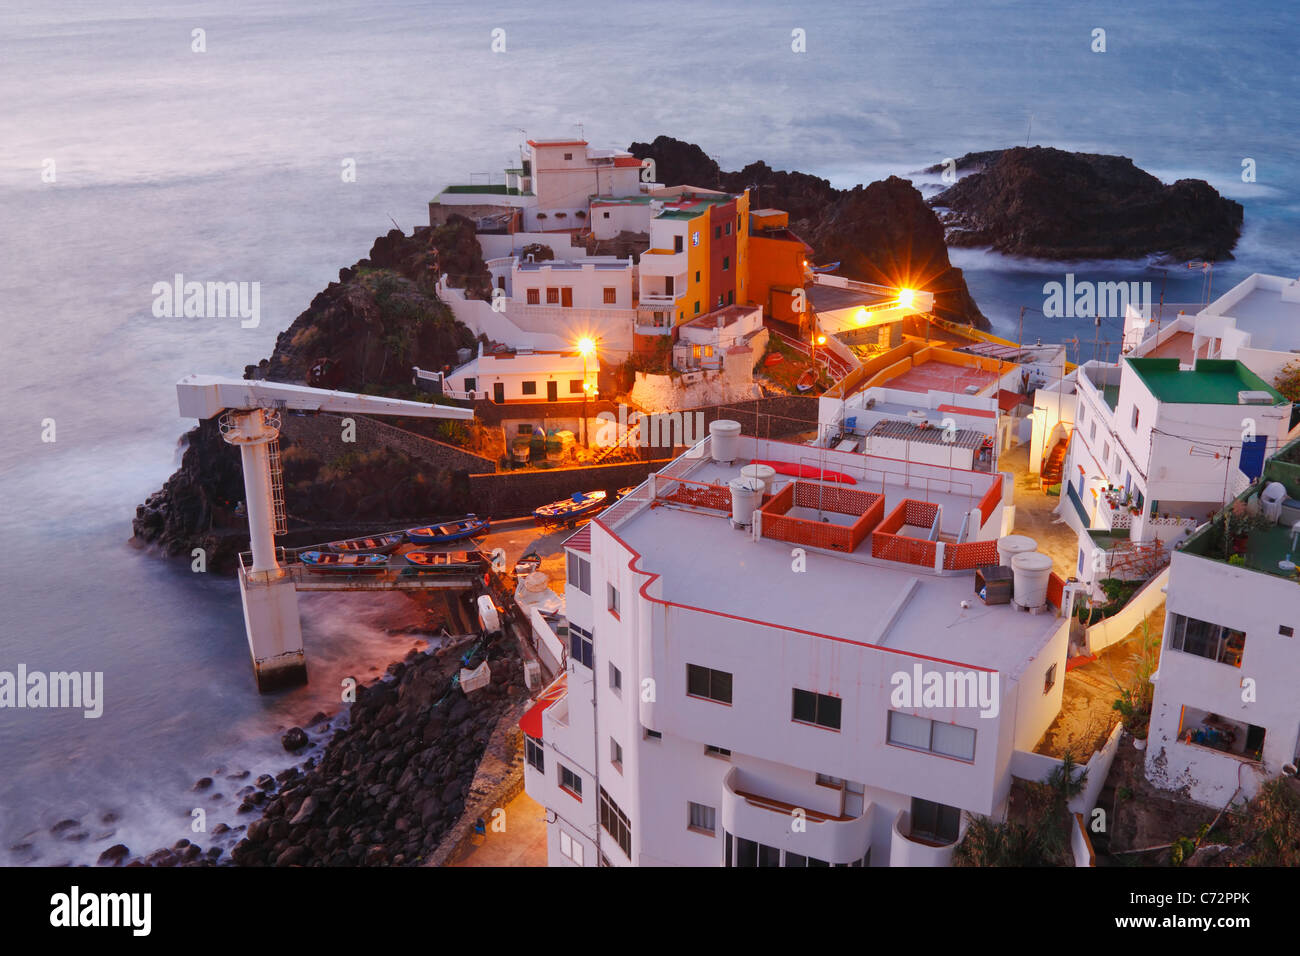 El Prix village on the north coast of Tenerife, Canary Islands, Spain - Stock Image